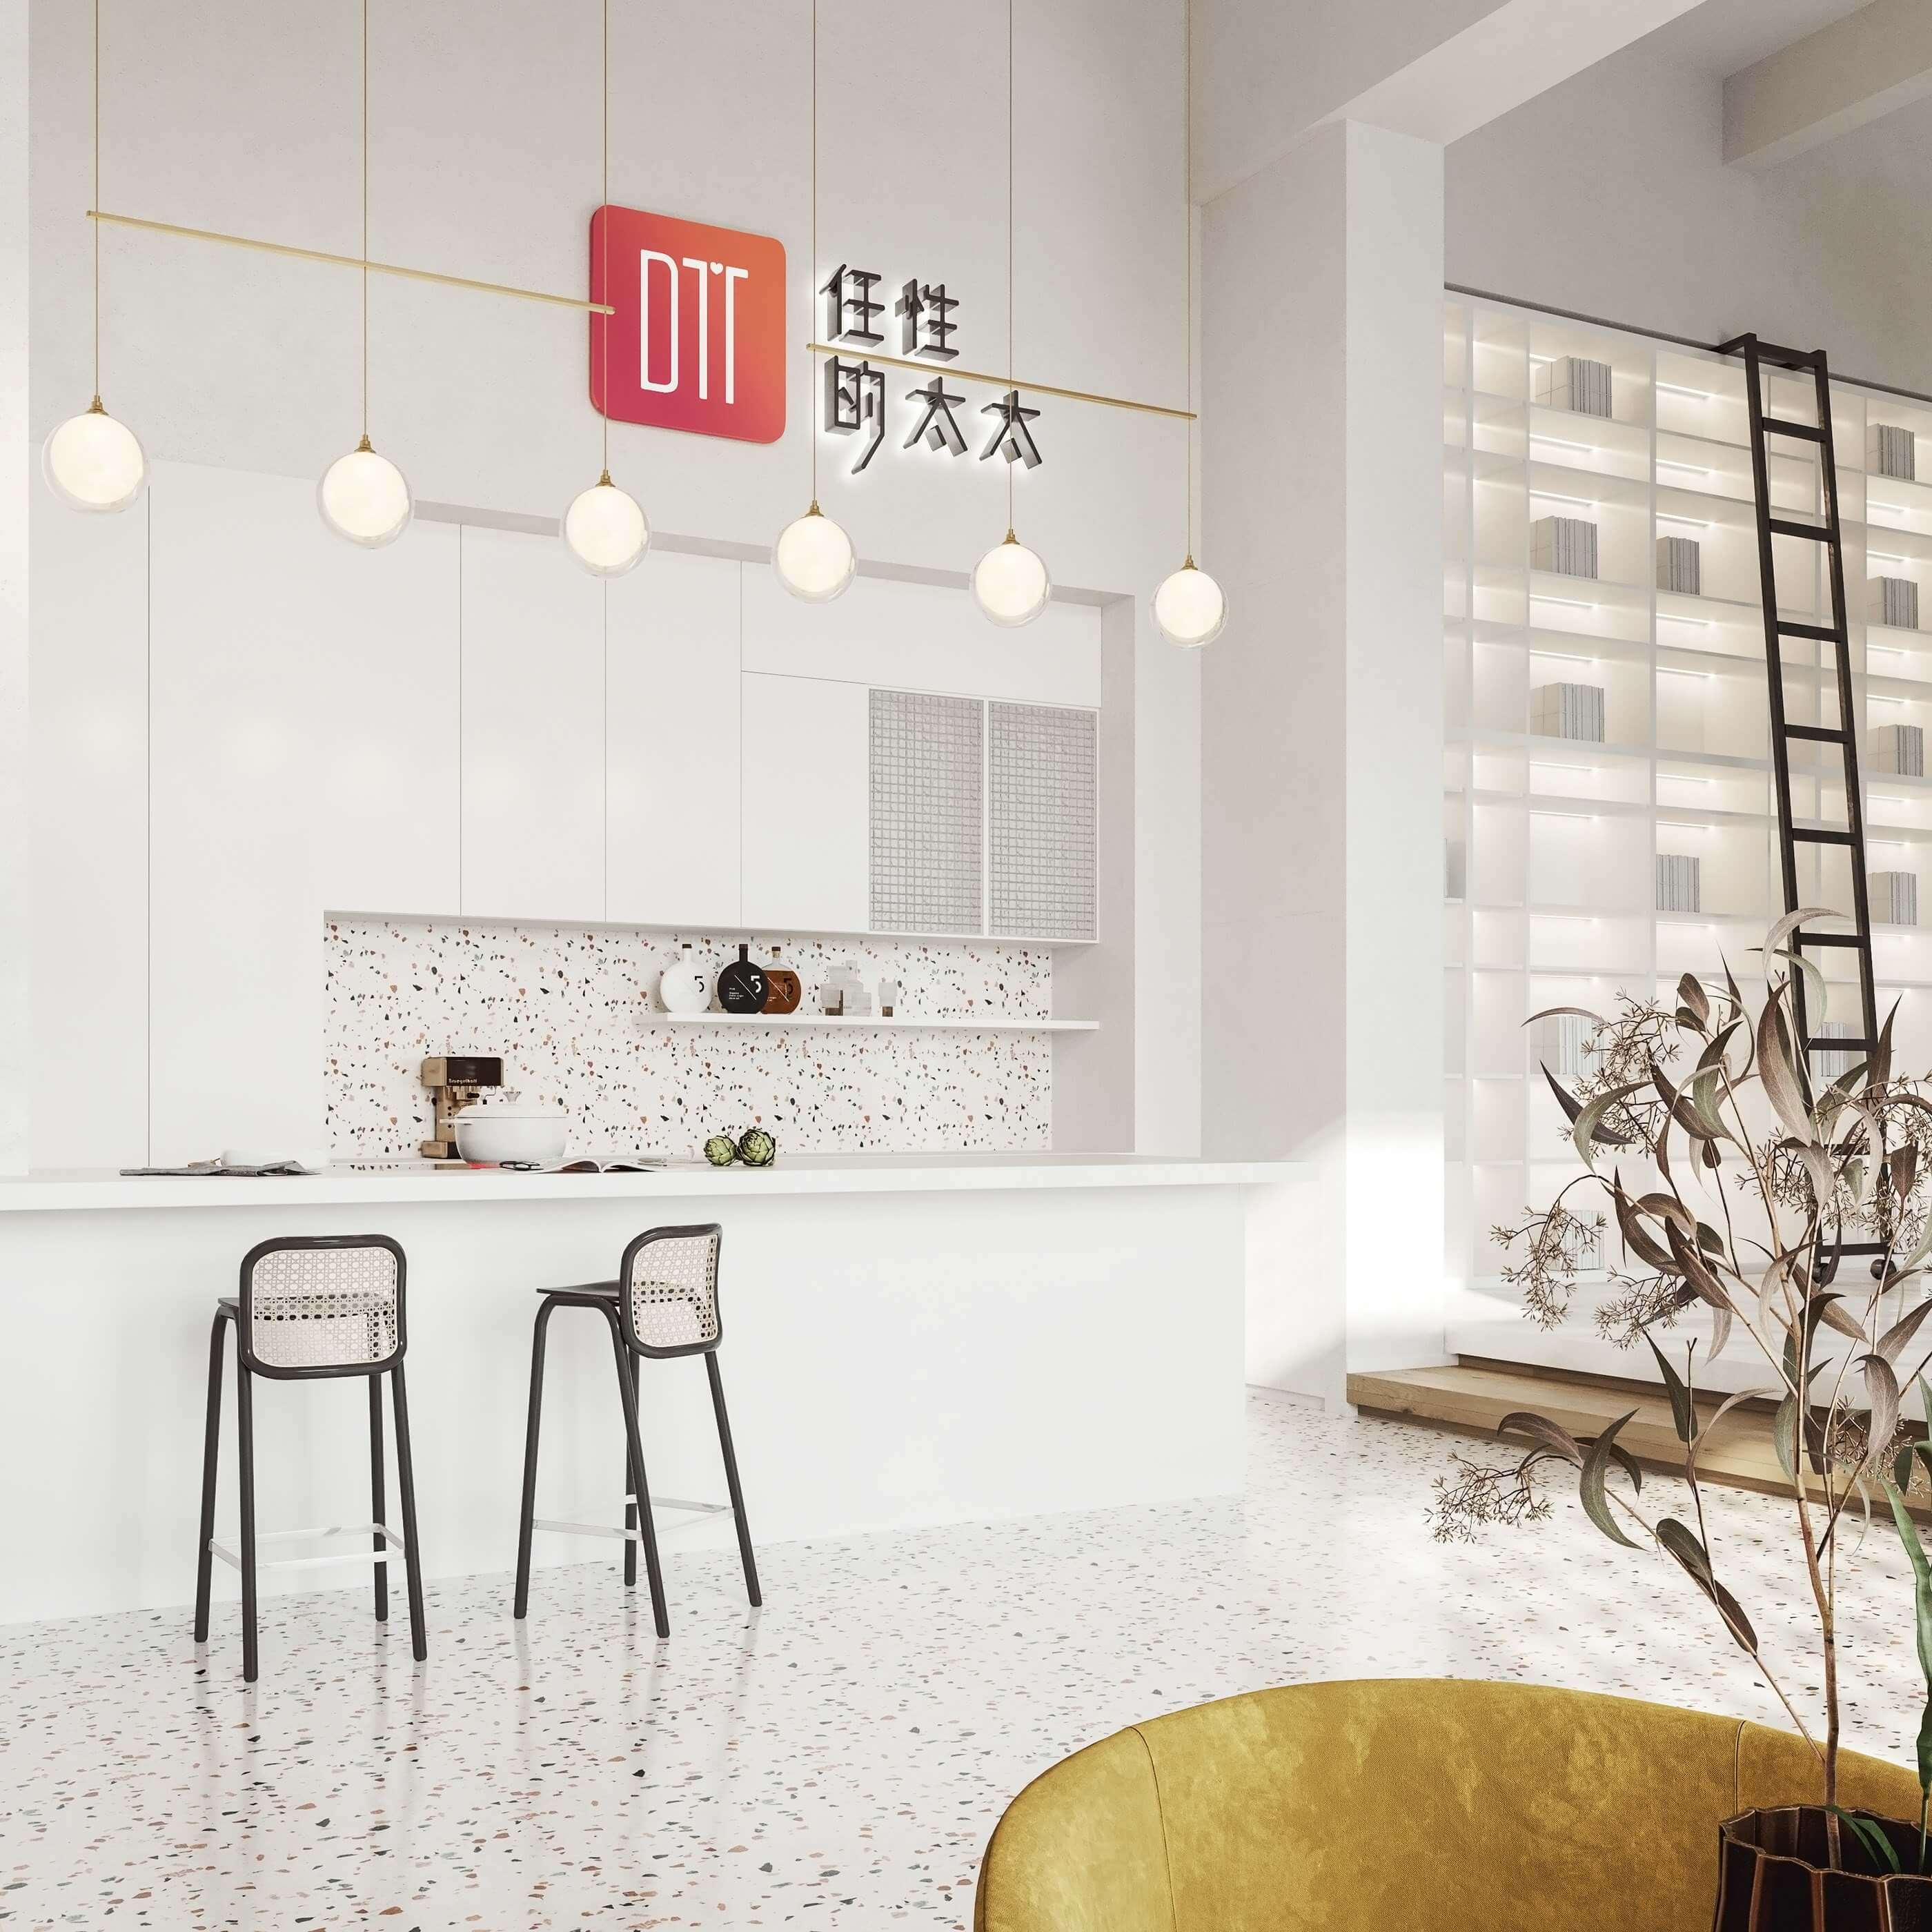 Modern bar restaurant design bar stool - cgi visualization